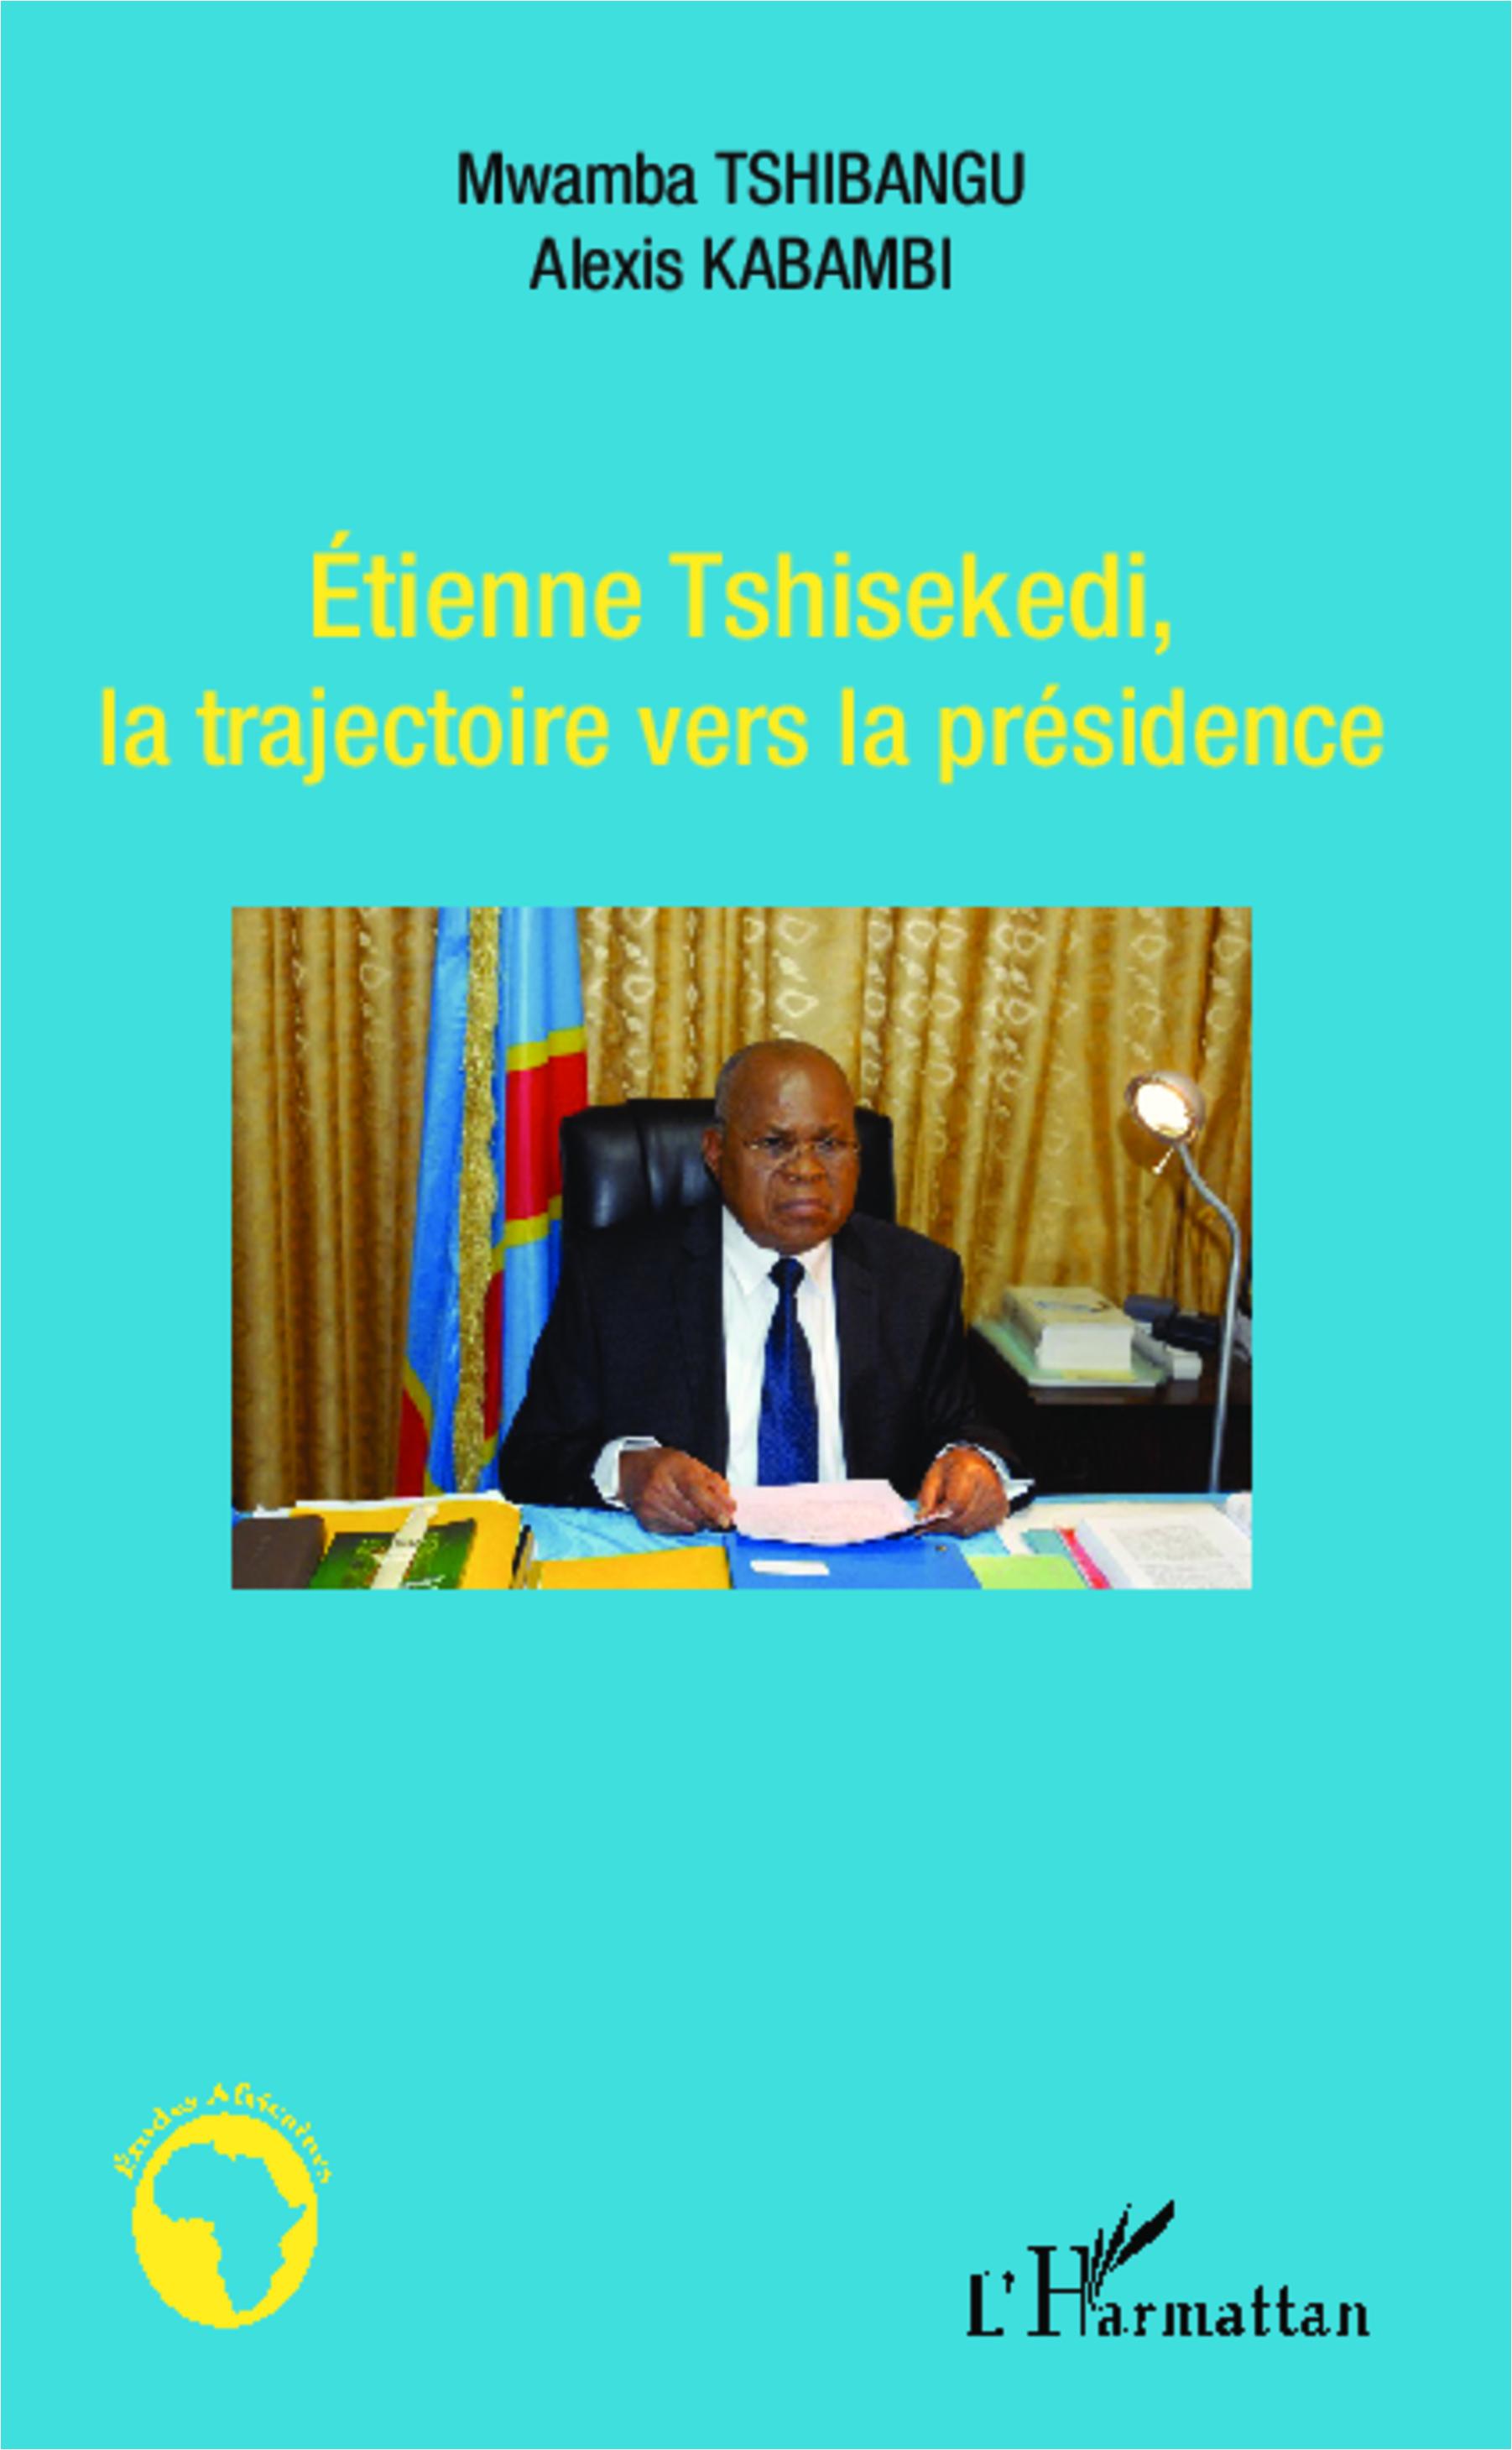 Etienne Tshisekedi, la trajectoire vers la présidence - Mwamba Tshibangu,Alexis Kabambi